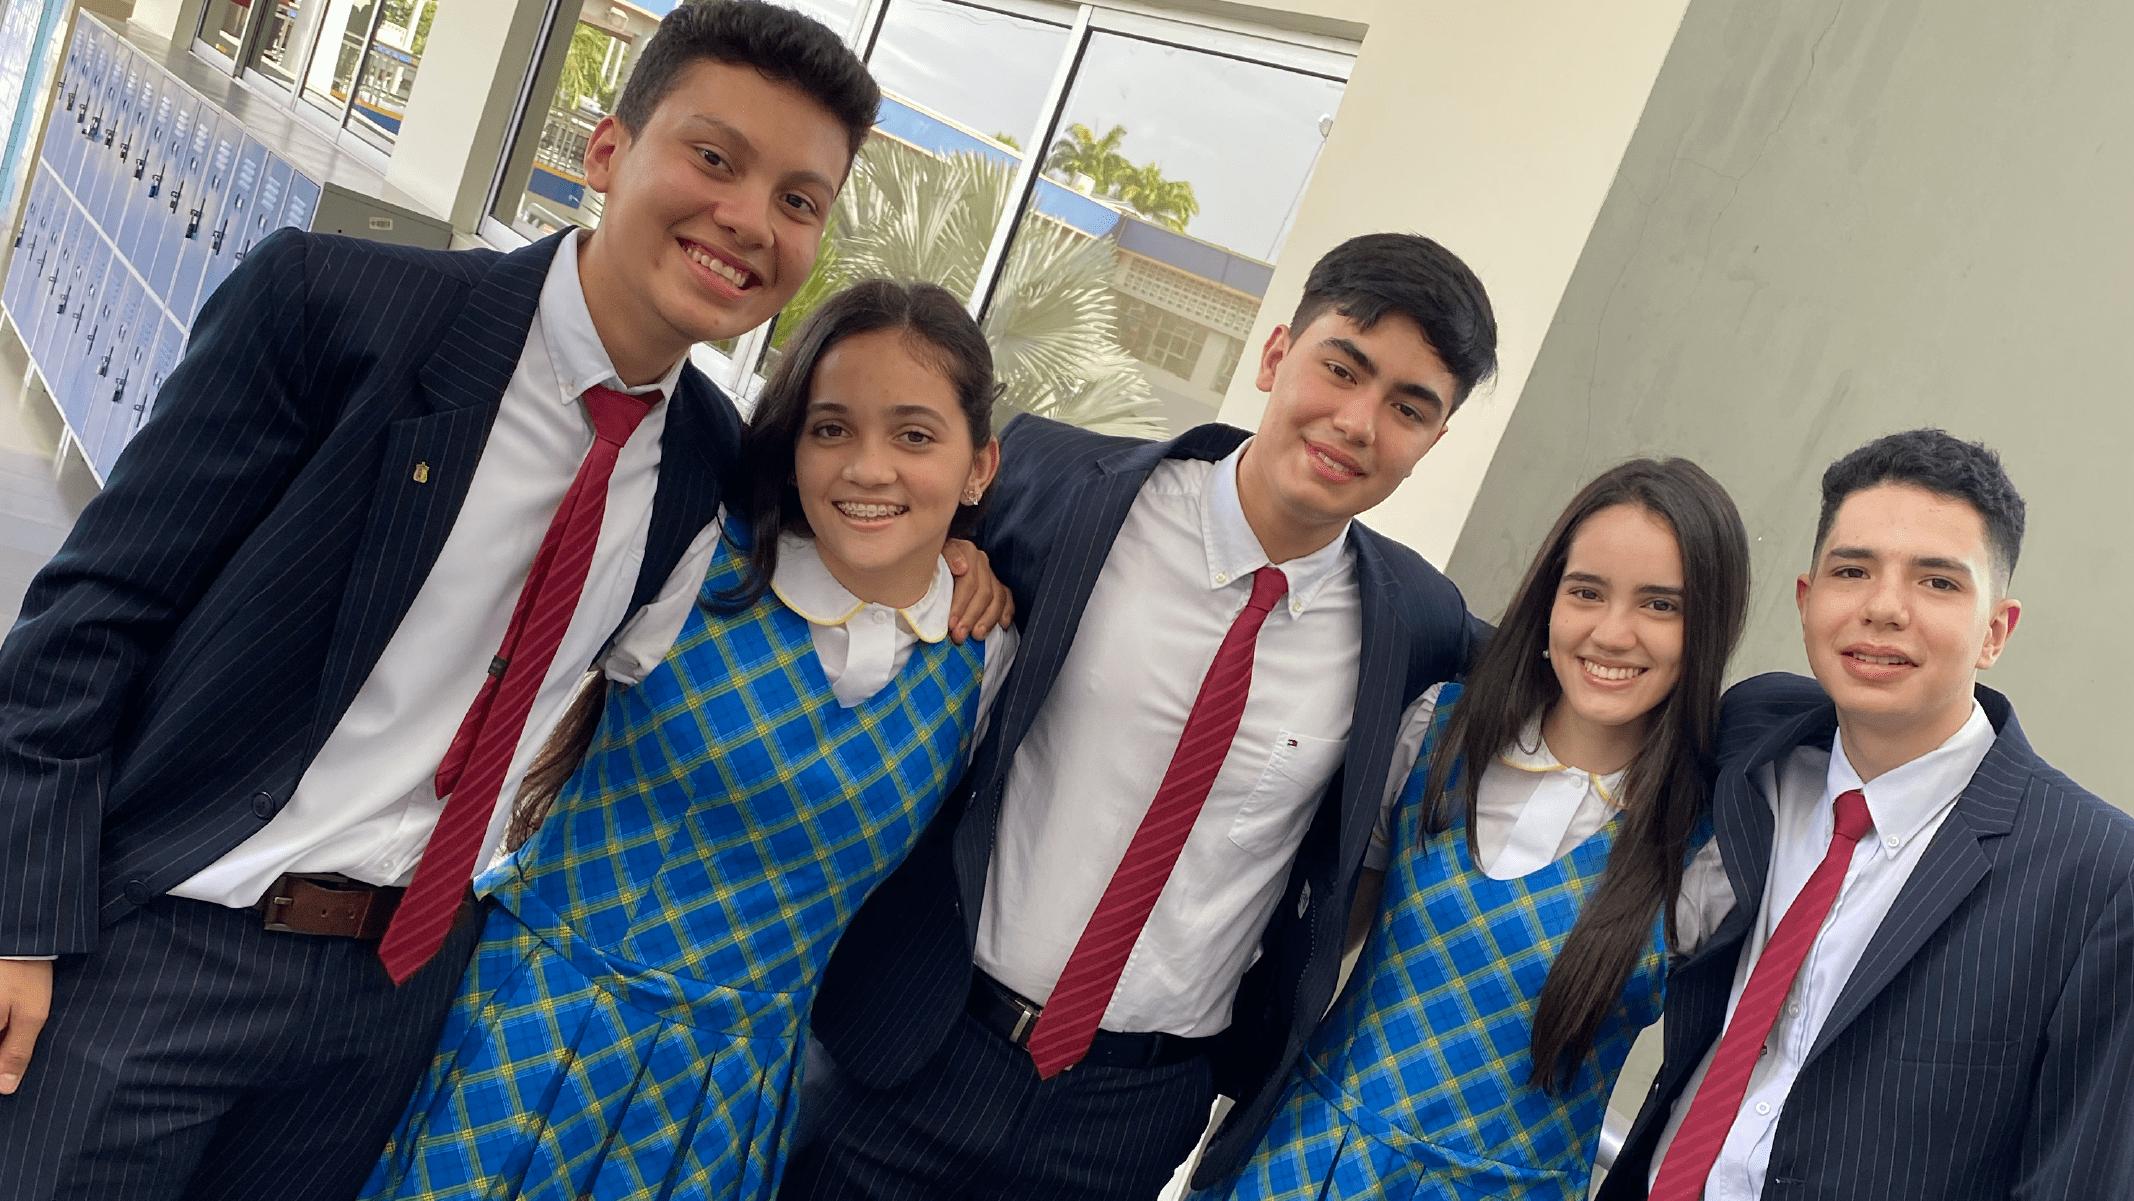 Colegio La Salle Bucaramanga - Los Mejores Colegios (1)